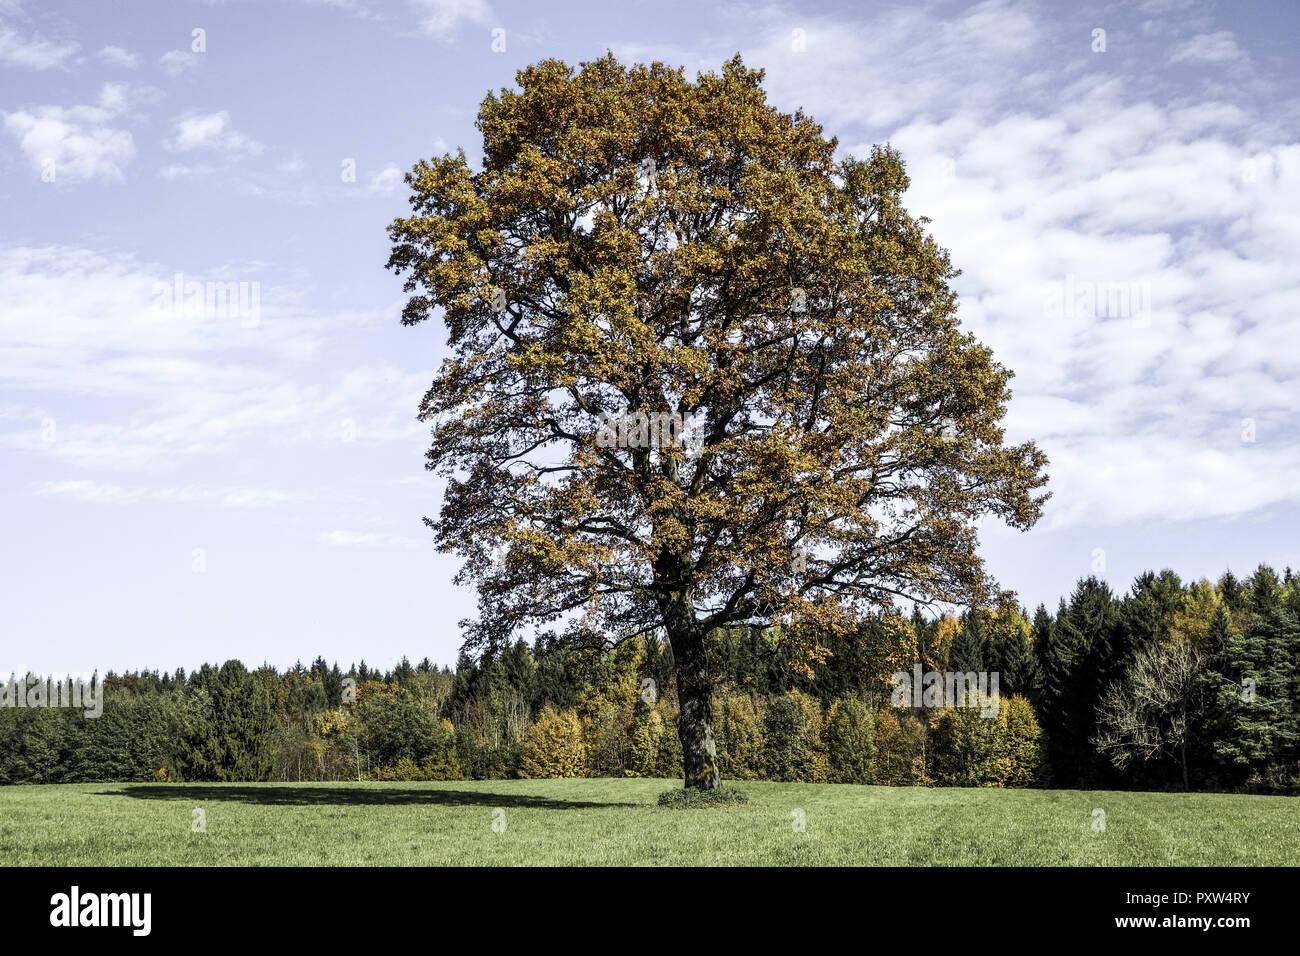 Einzelner Baum, Eiche im Herbst, Single oak tree in autumn, Oak, Tree, Trees, Autumn, Leaves, Autumnal, Season, Landscape, Nature, Germany, Bavaria, E - Stock Image